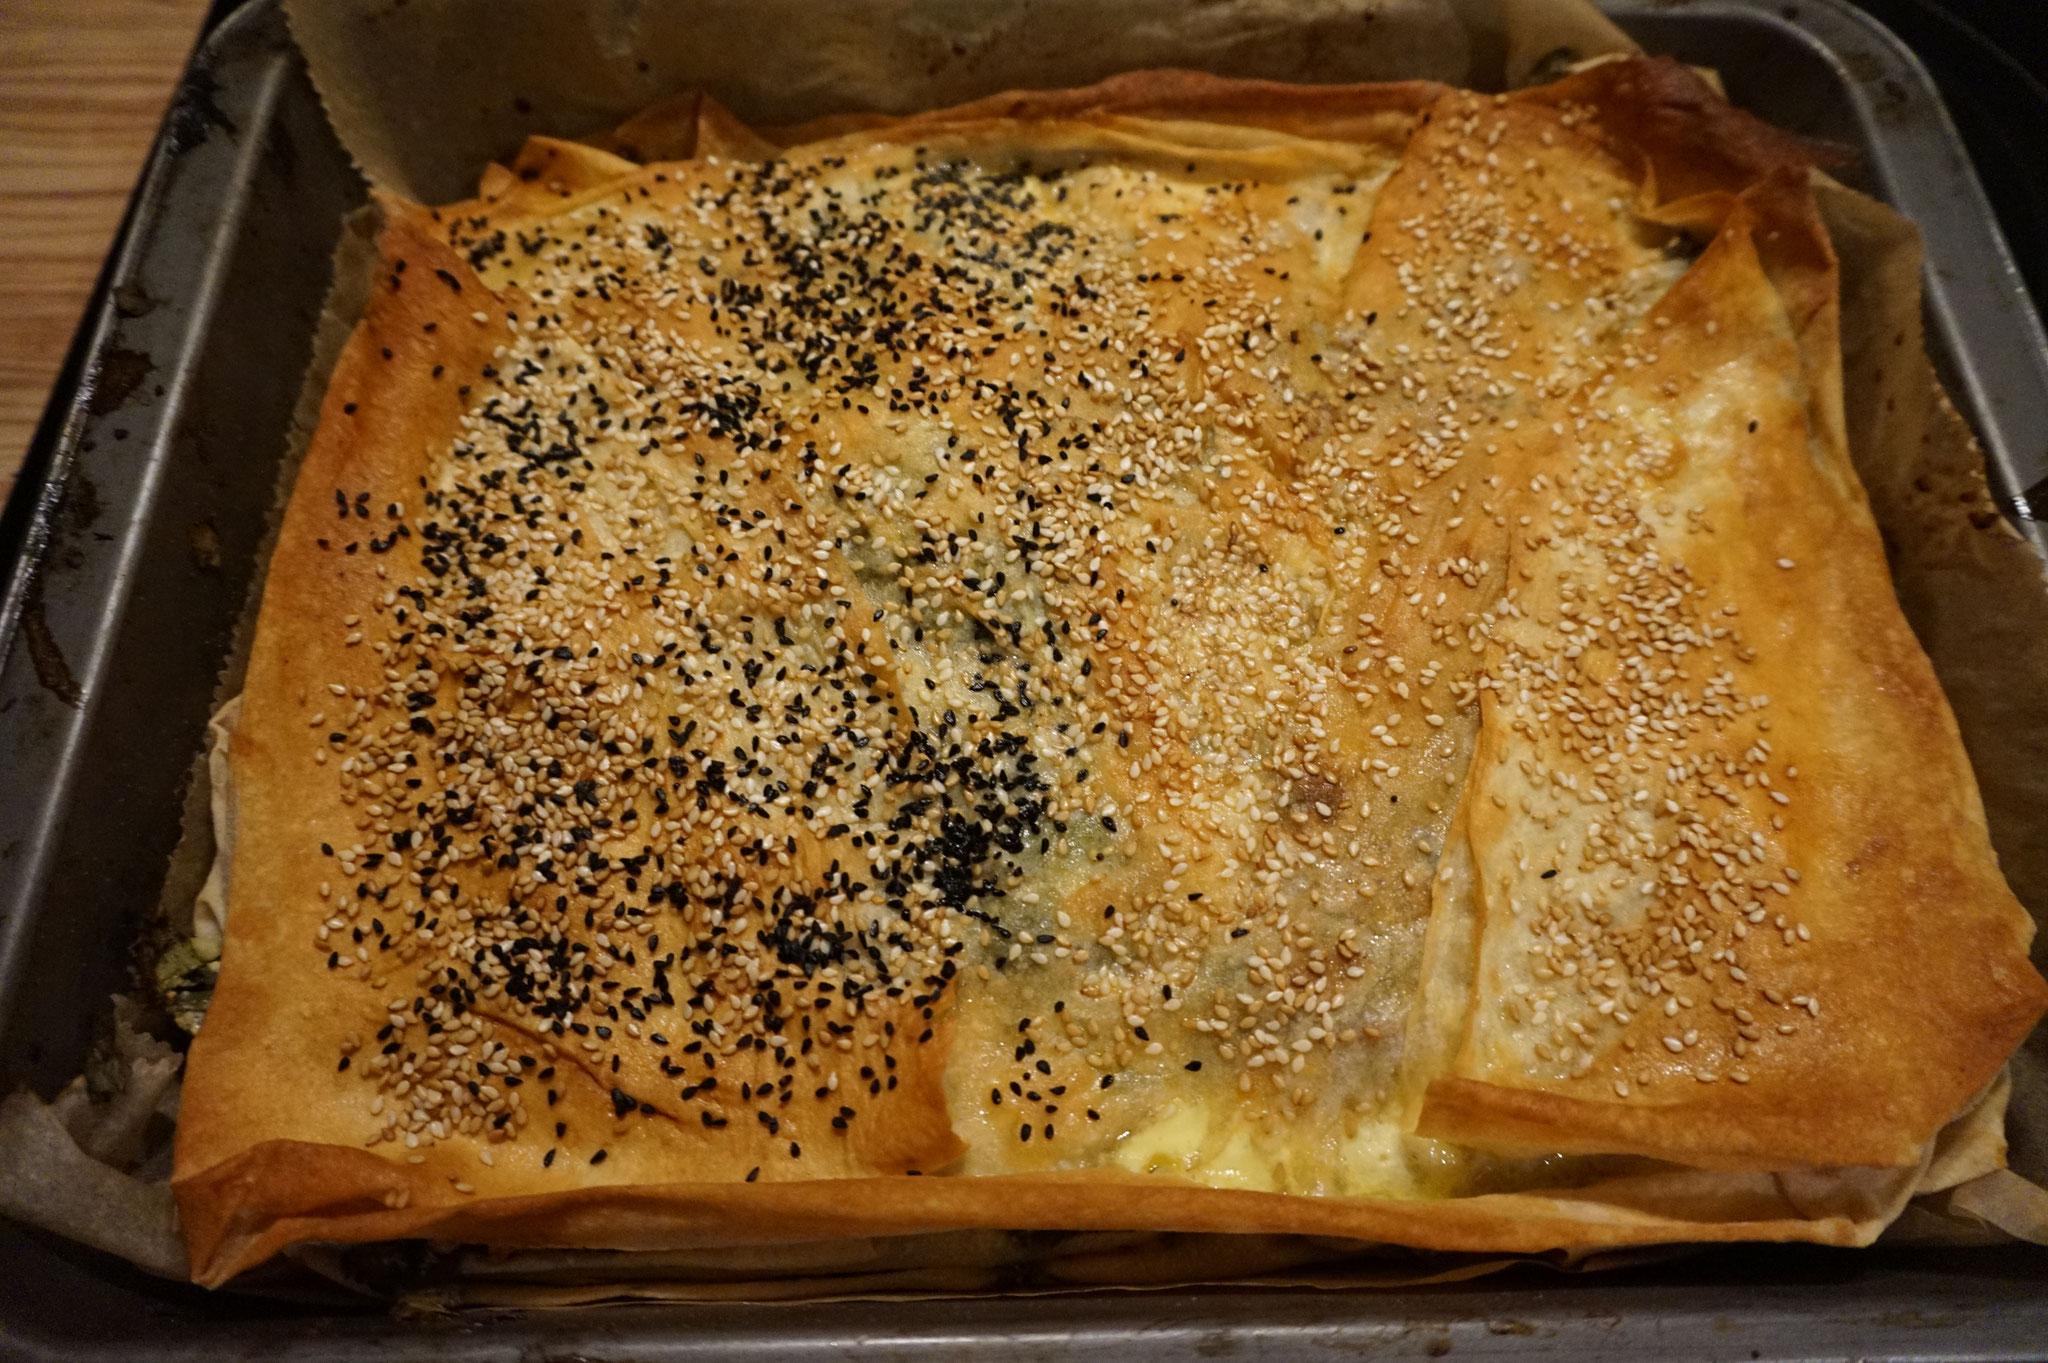 Rezept - Boerek im Blech - Tepsi Boeregi - mit 2 Fuellungen